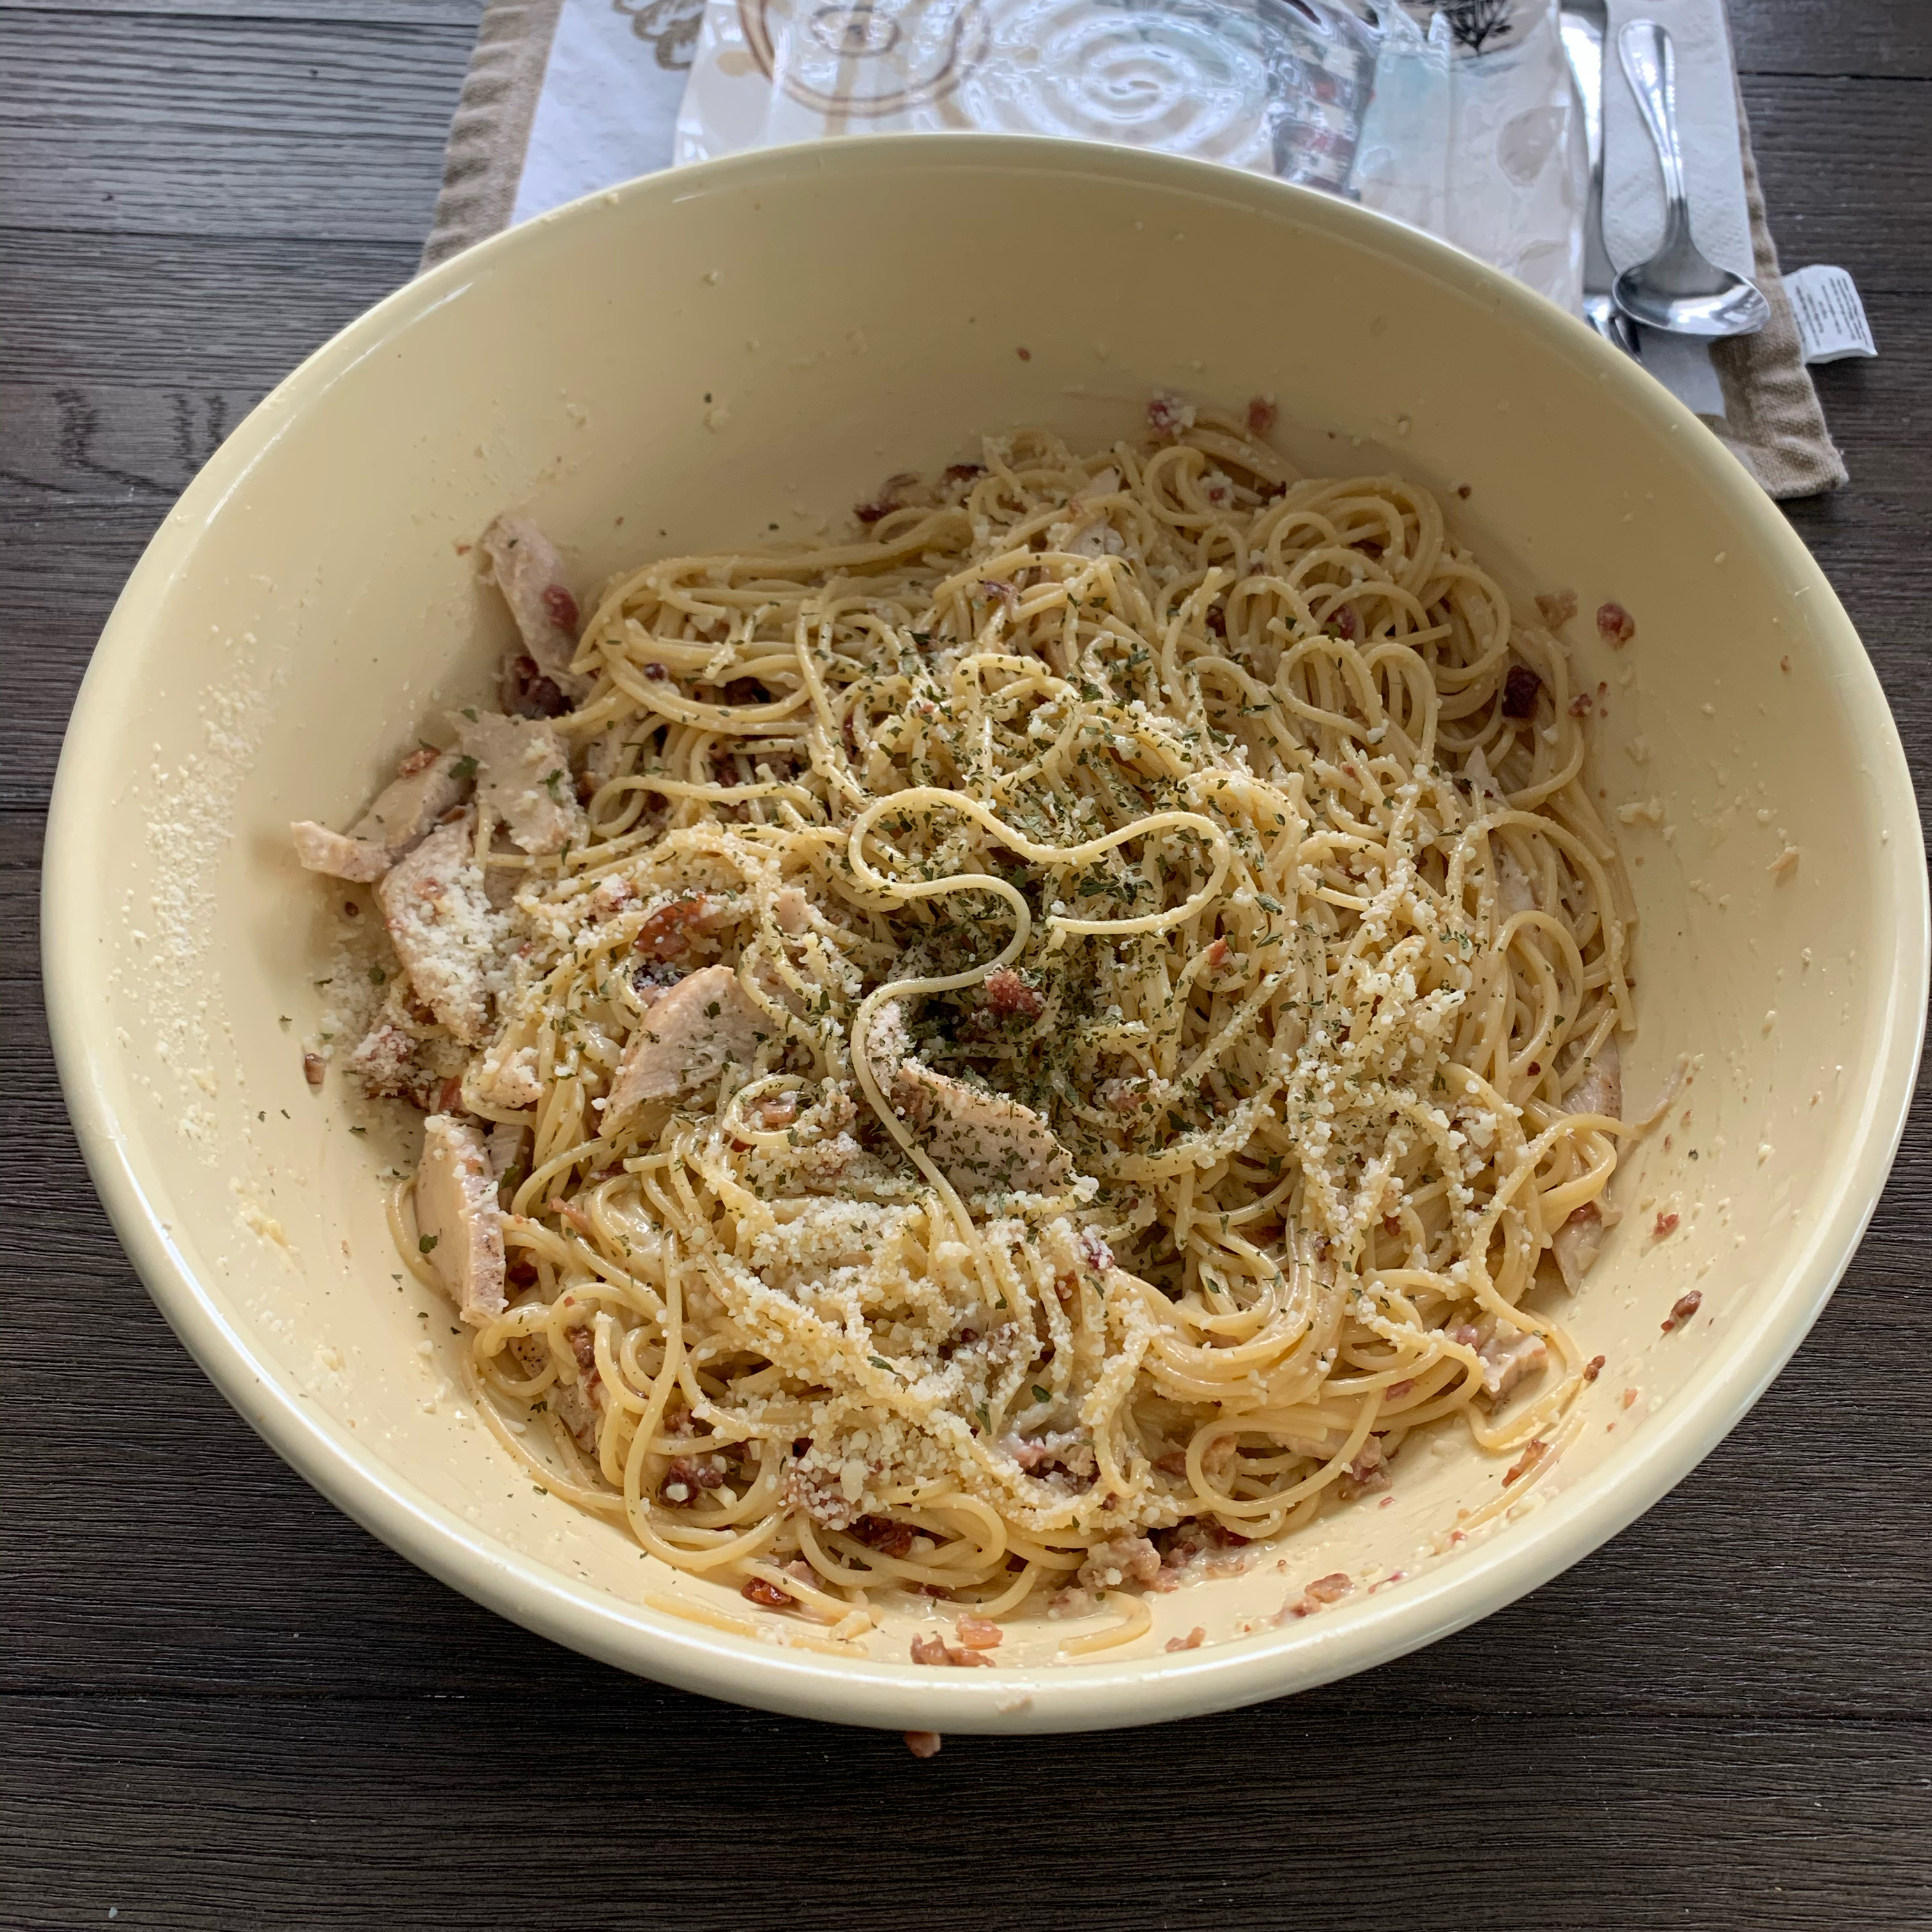 Chicken Carbonara with Creamy Parmesan Sauce